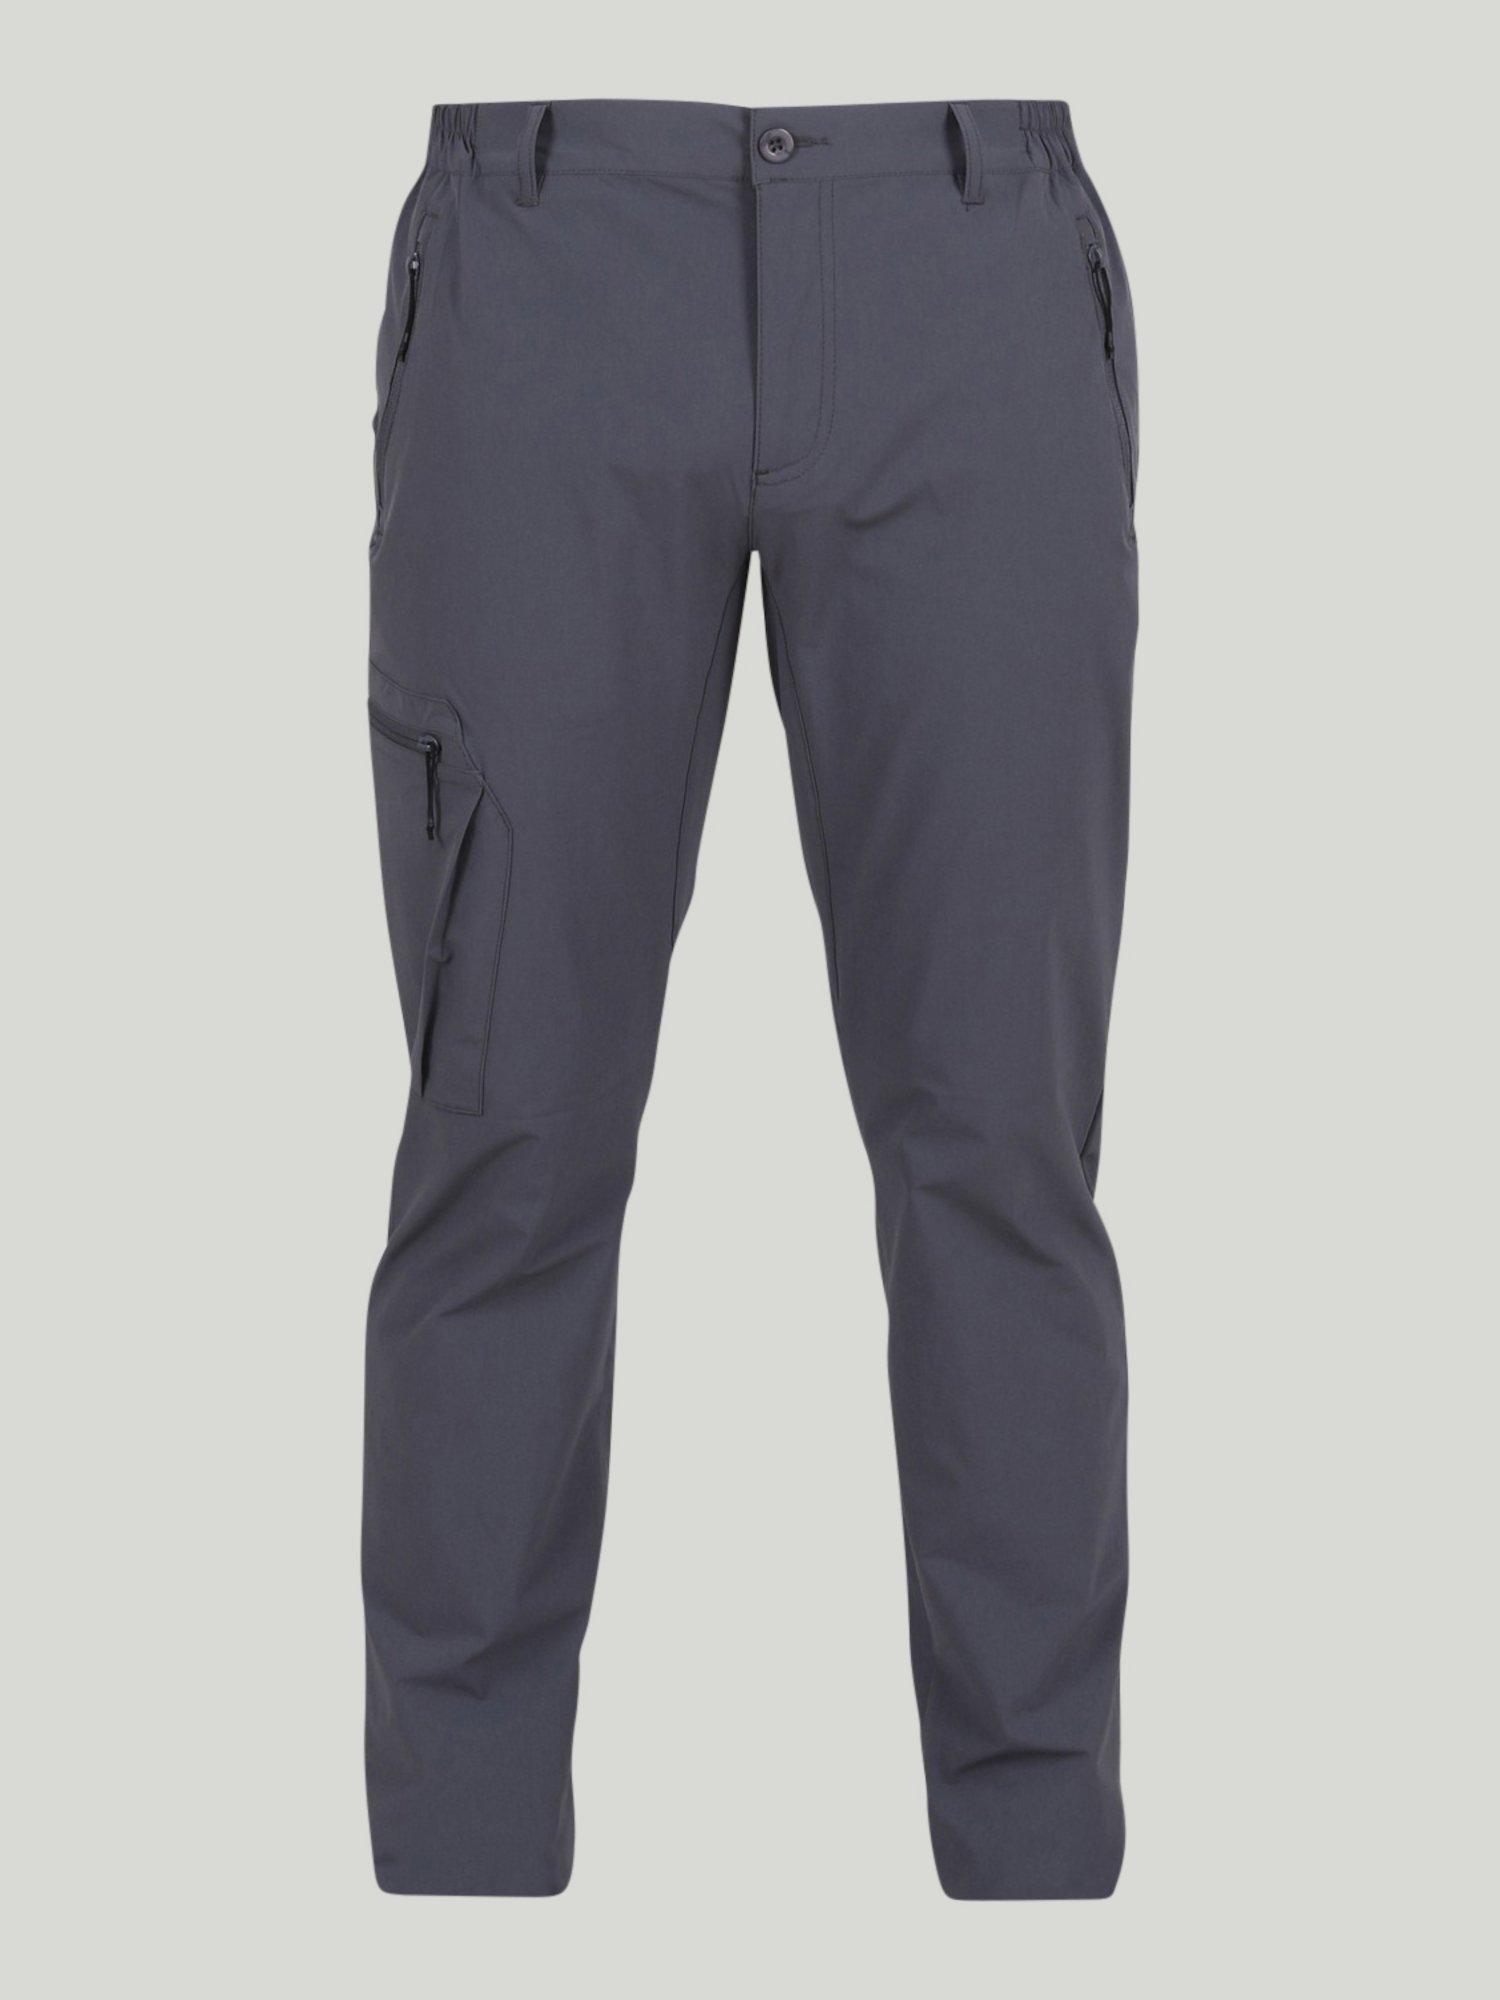 Pantaloni Cala Gonone - Antracite